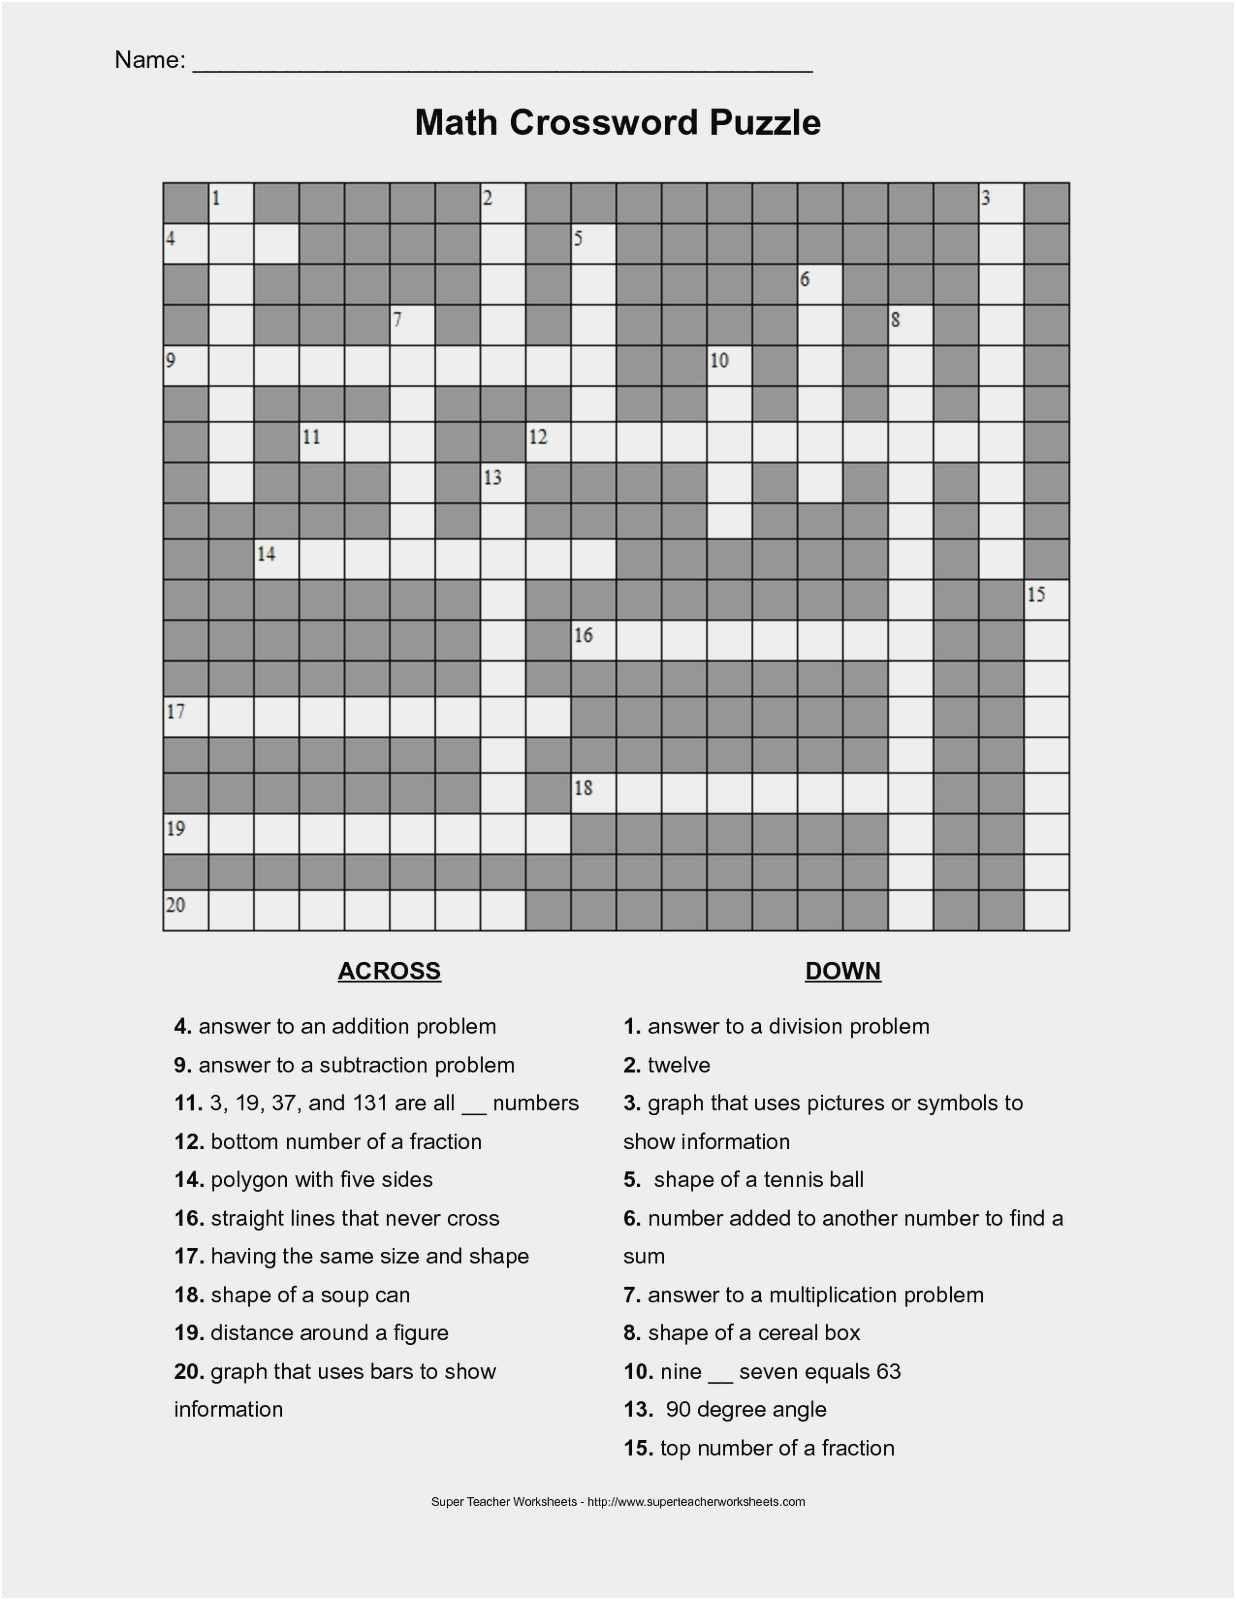 Algebra Tiles Worksheets 6th Grade 6th Grade Algebra Tiles Worksheet Maths Puzzles Math Addition Worksheets Crossword Puzzles